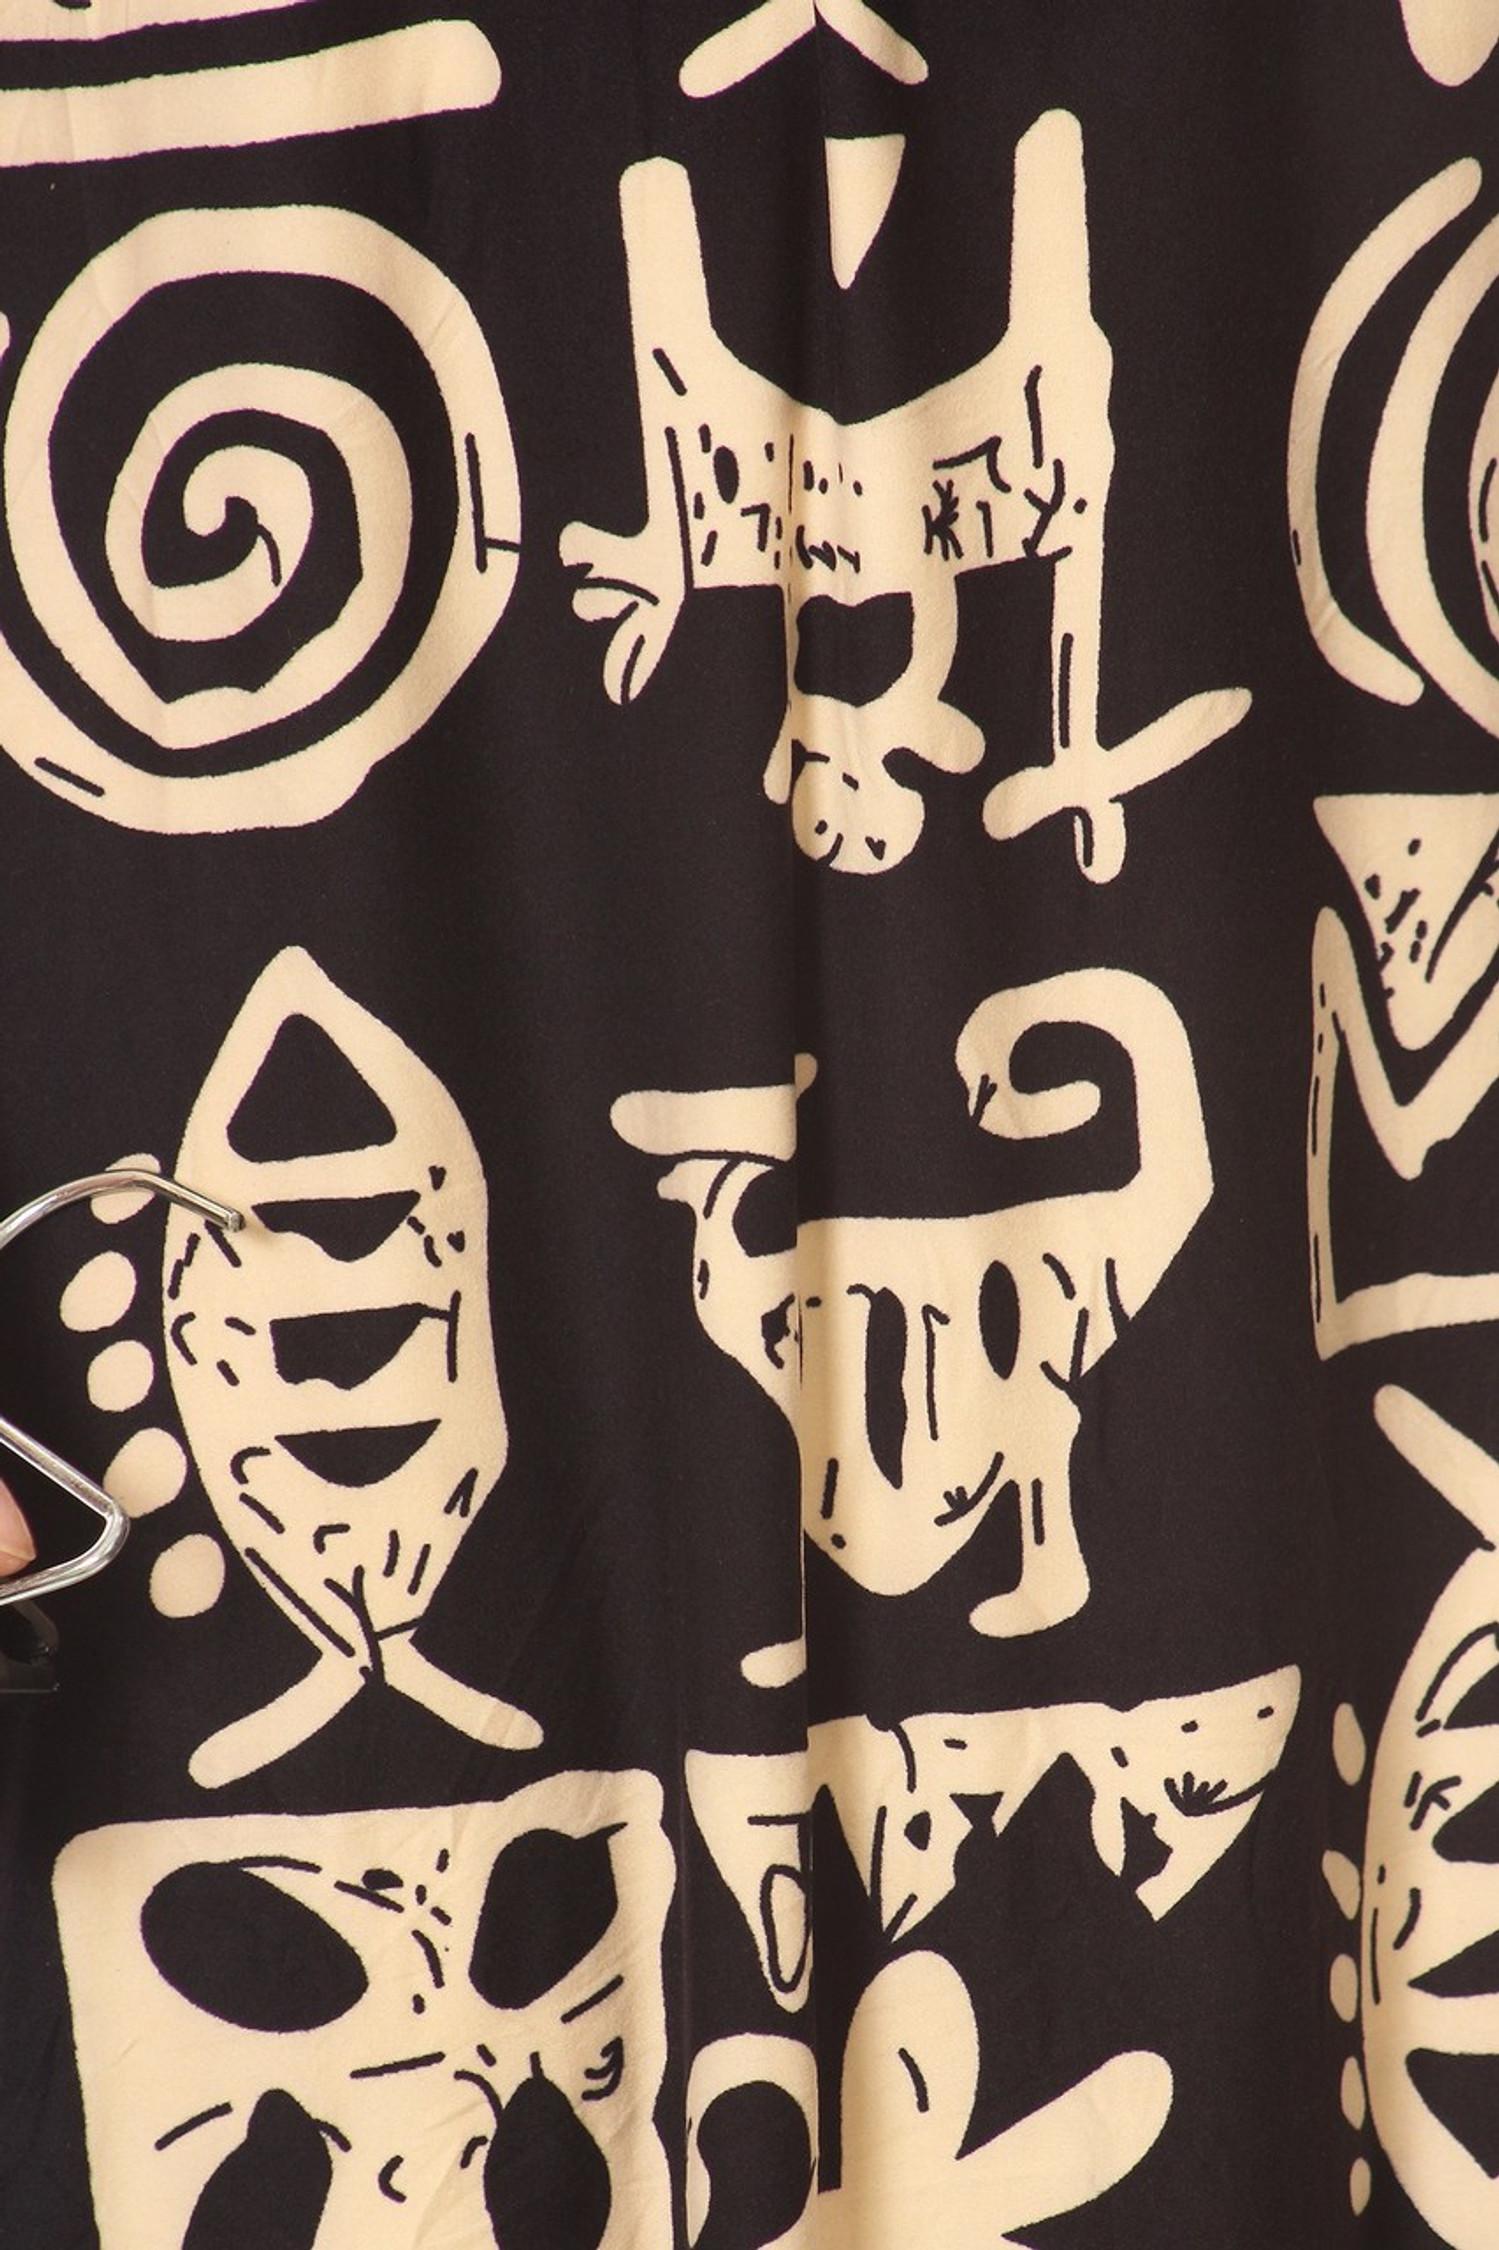 Brushed Elegant Tribal Symbols Maxi Dress